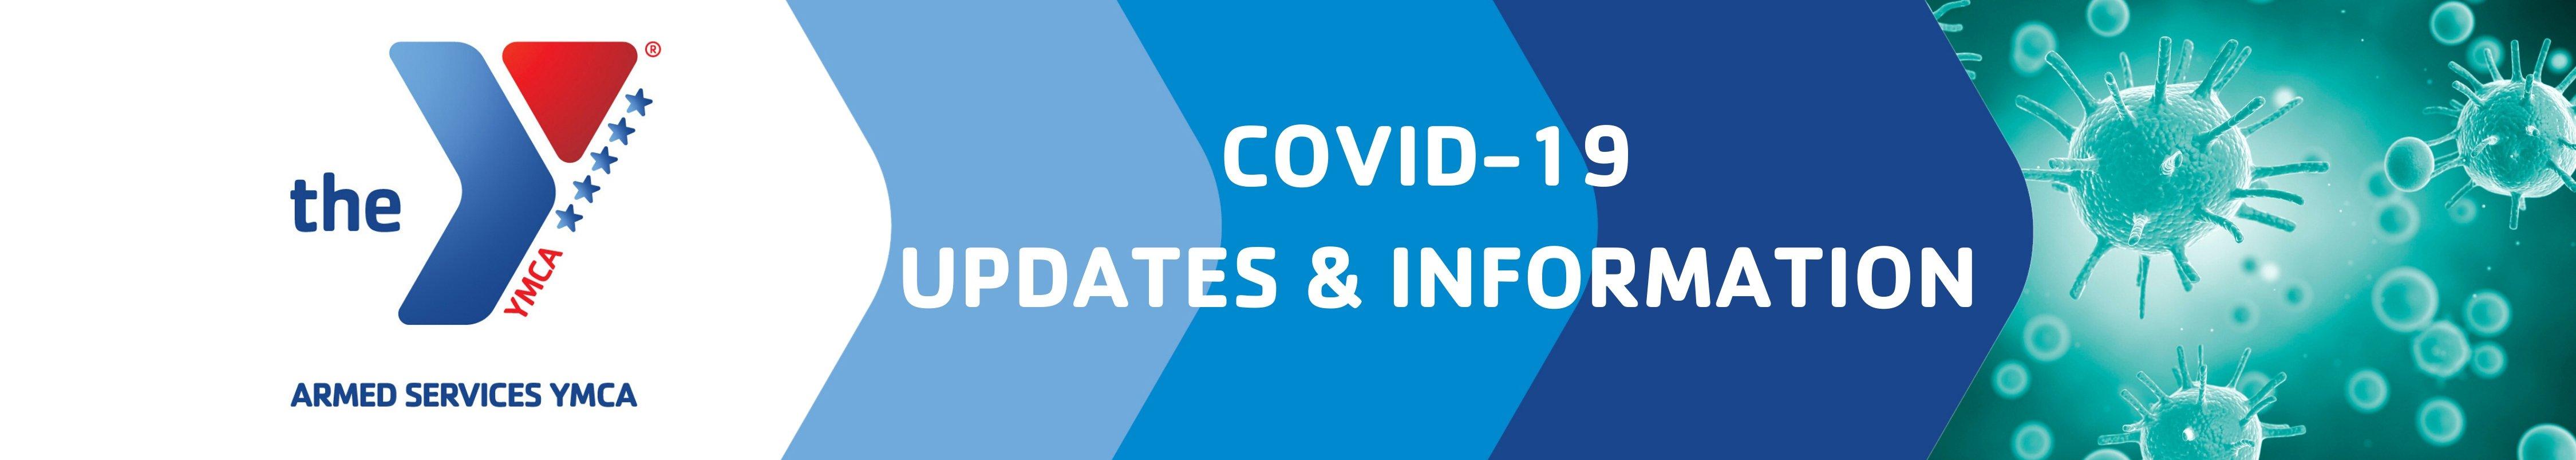 HQ-2020-COVID-Blog HeaderB